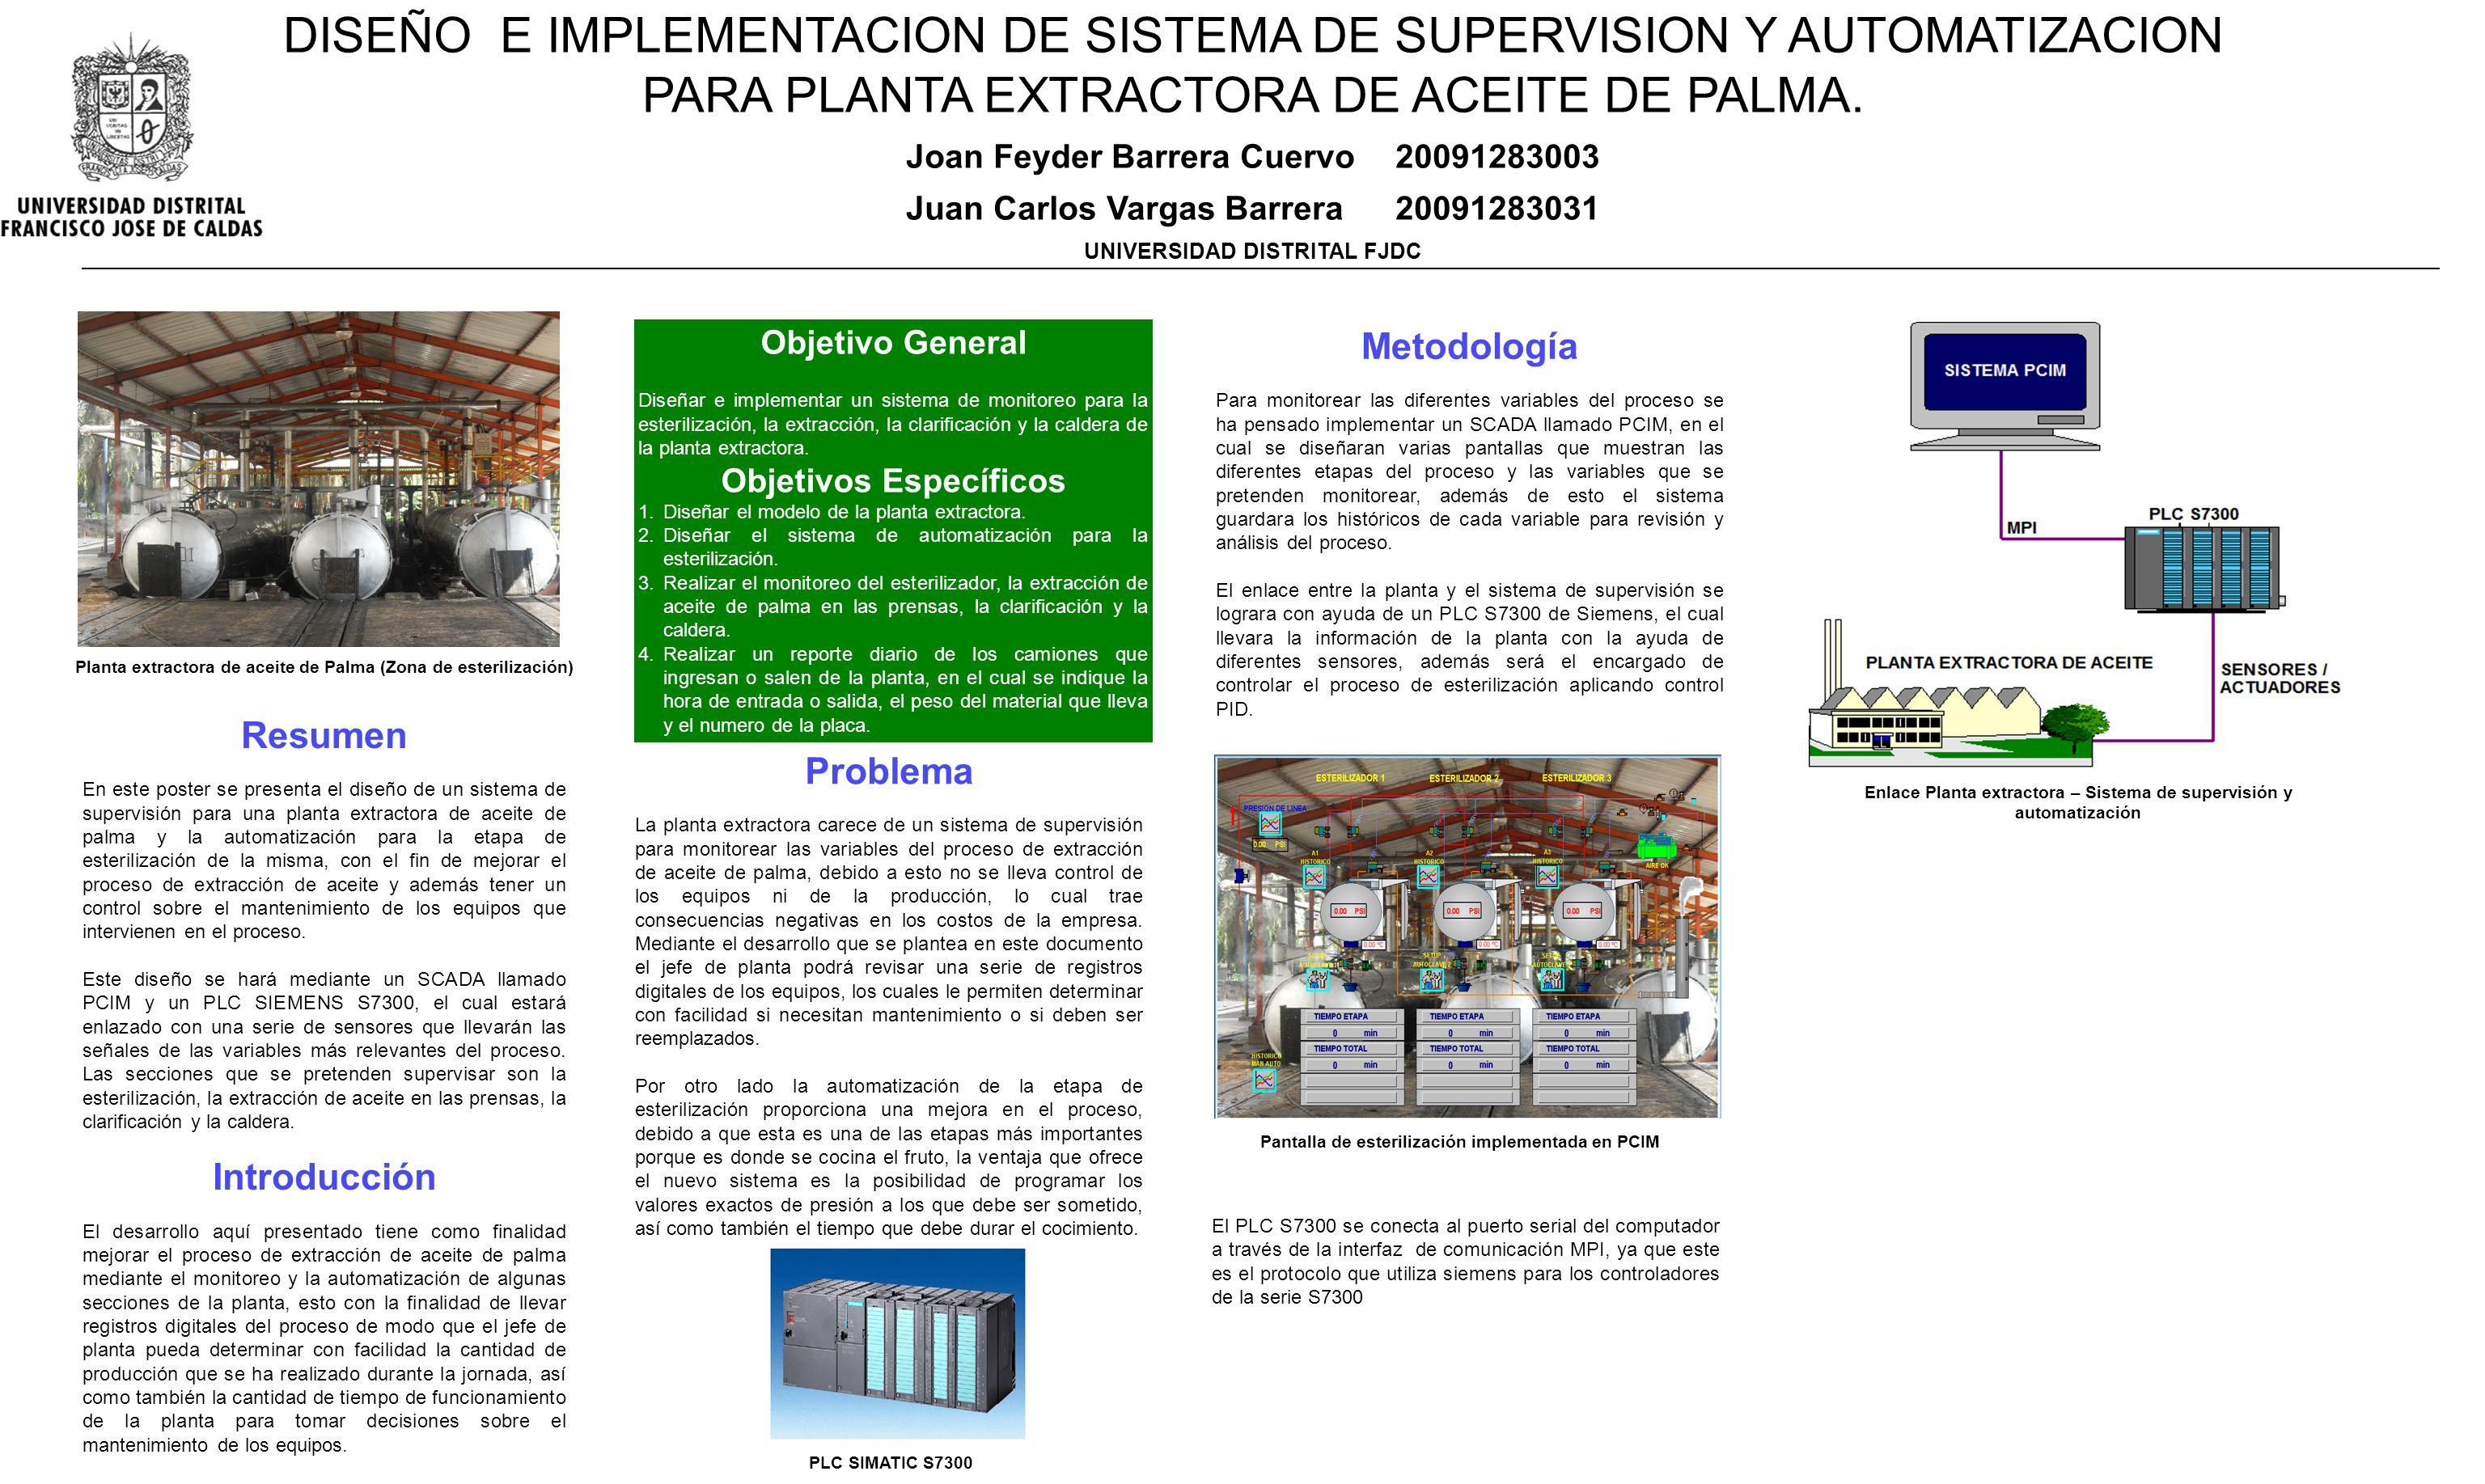 DISEÑO E IMPLEMENTACION DE SISTEMA DE SUPERVISION Y AUTOMATIZACION